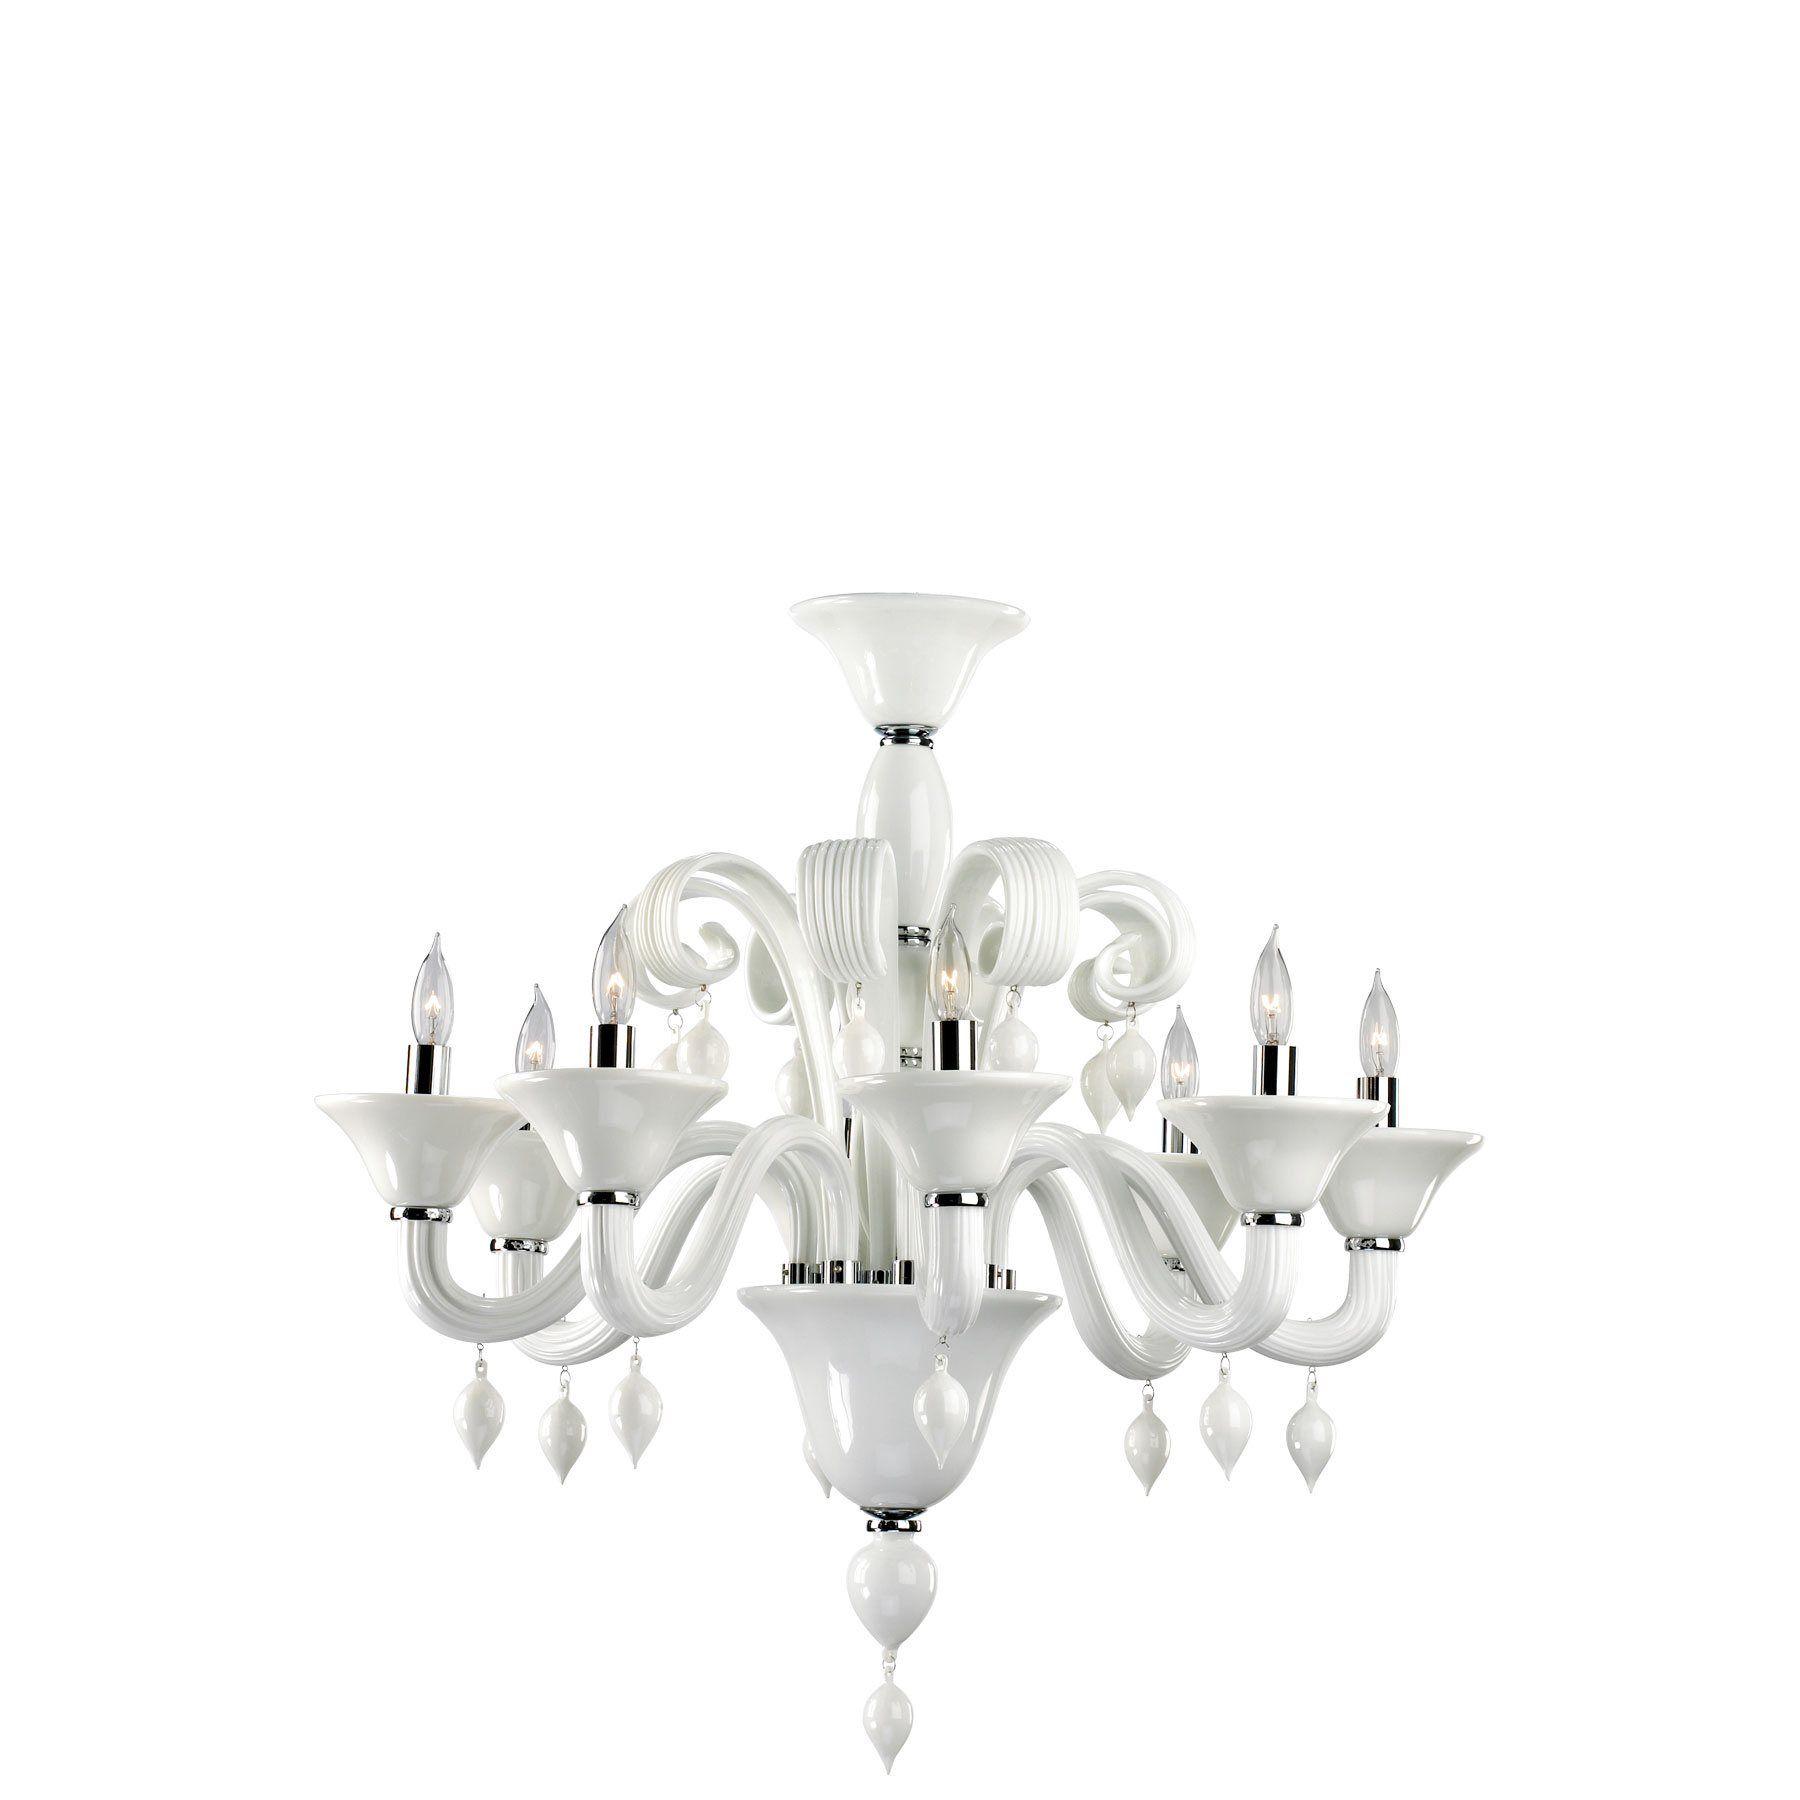 South Shore Decorating Cyan Design 6496 8 14 Treviso White Murano